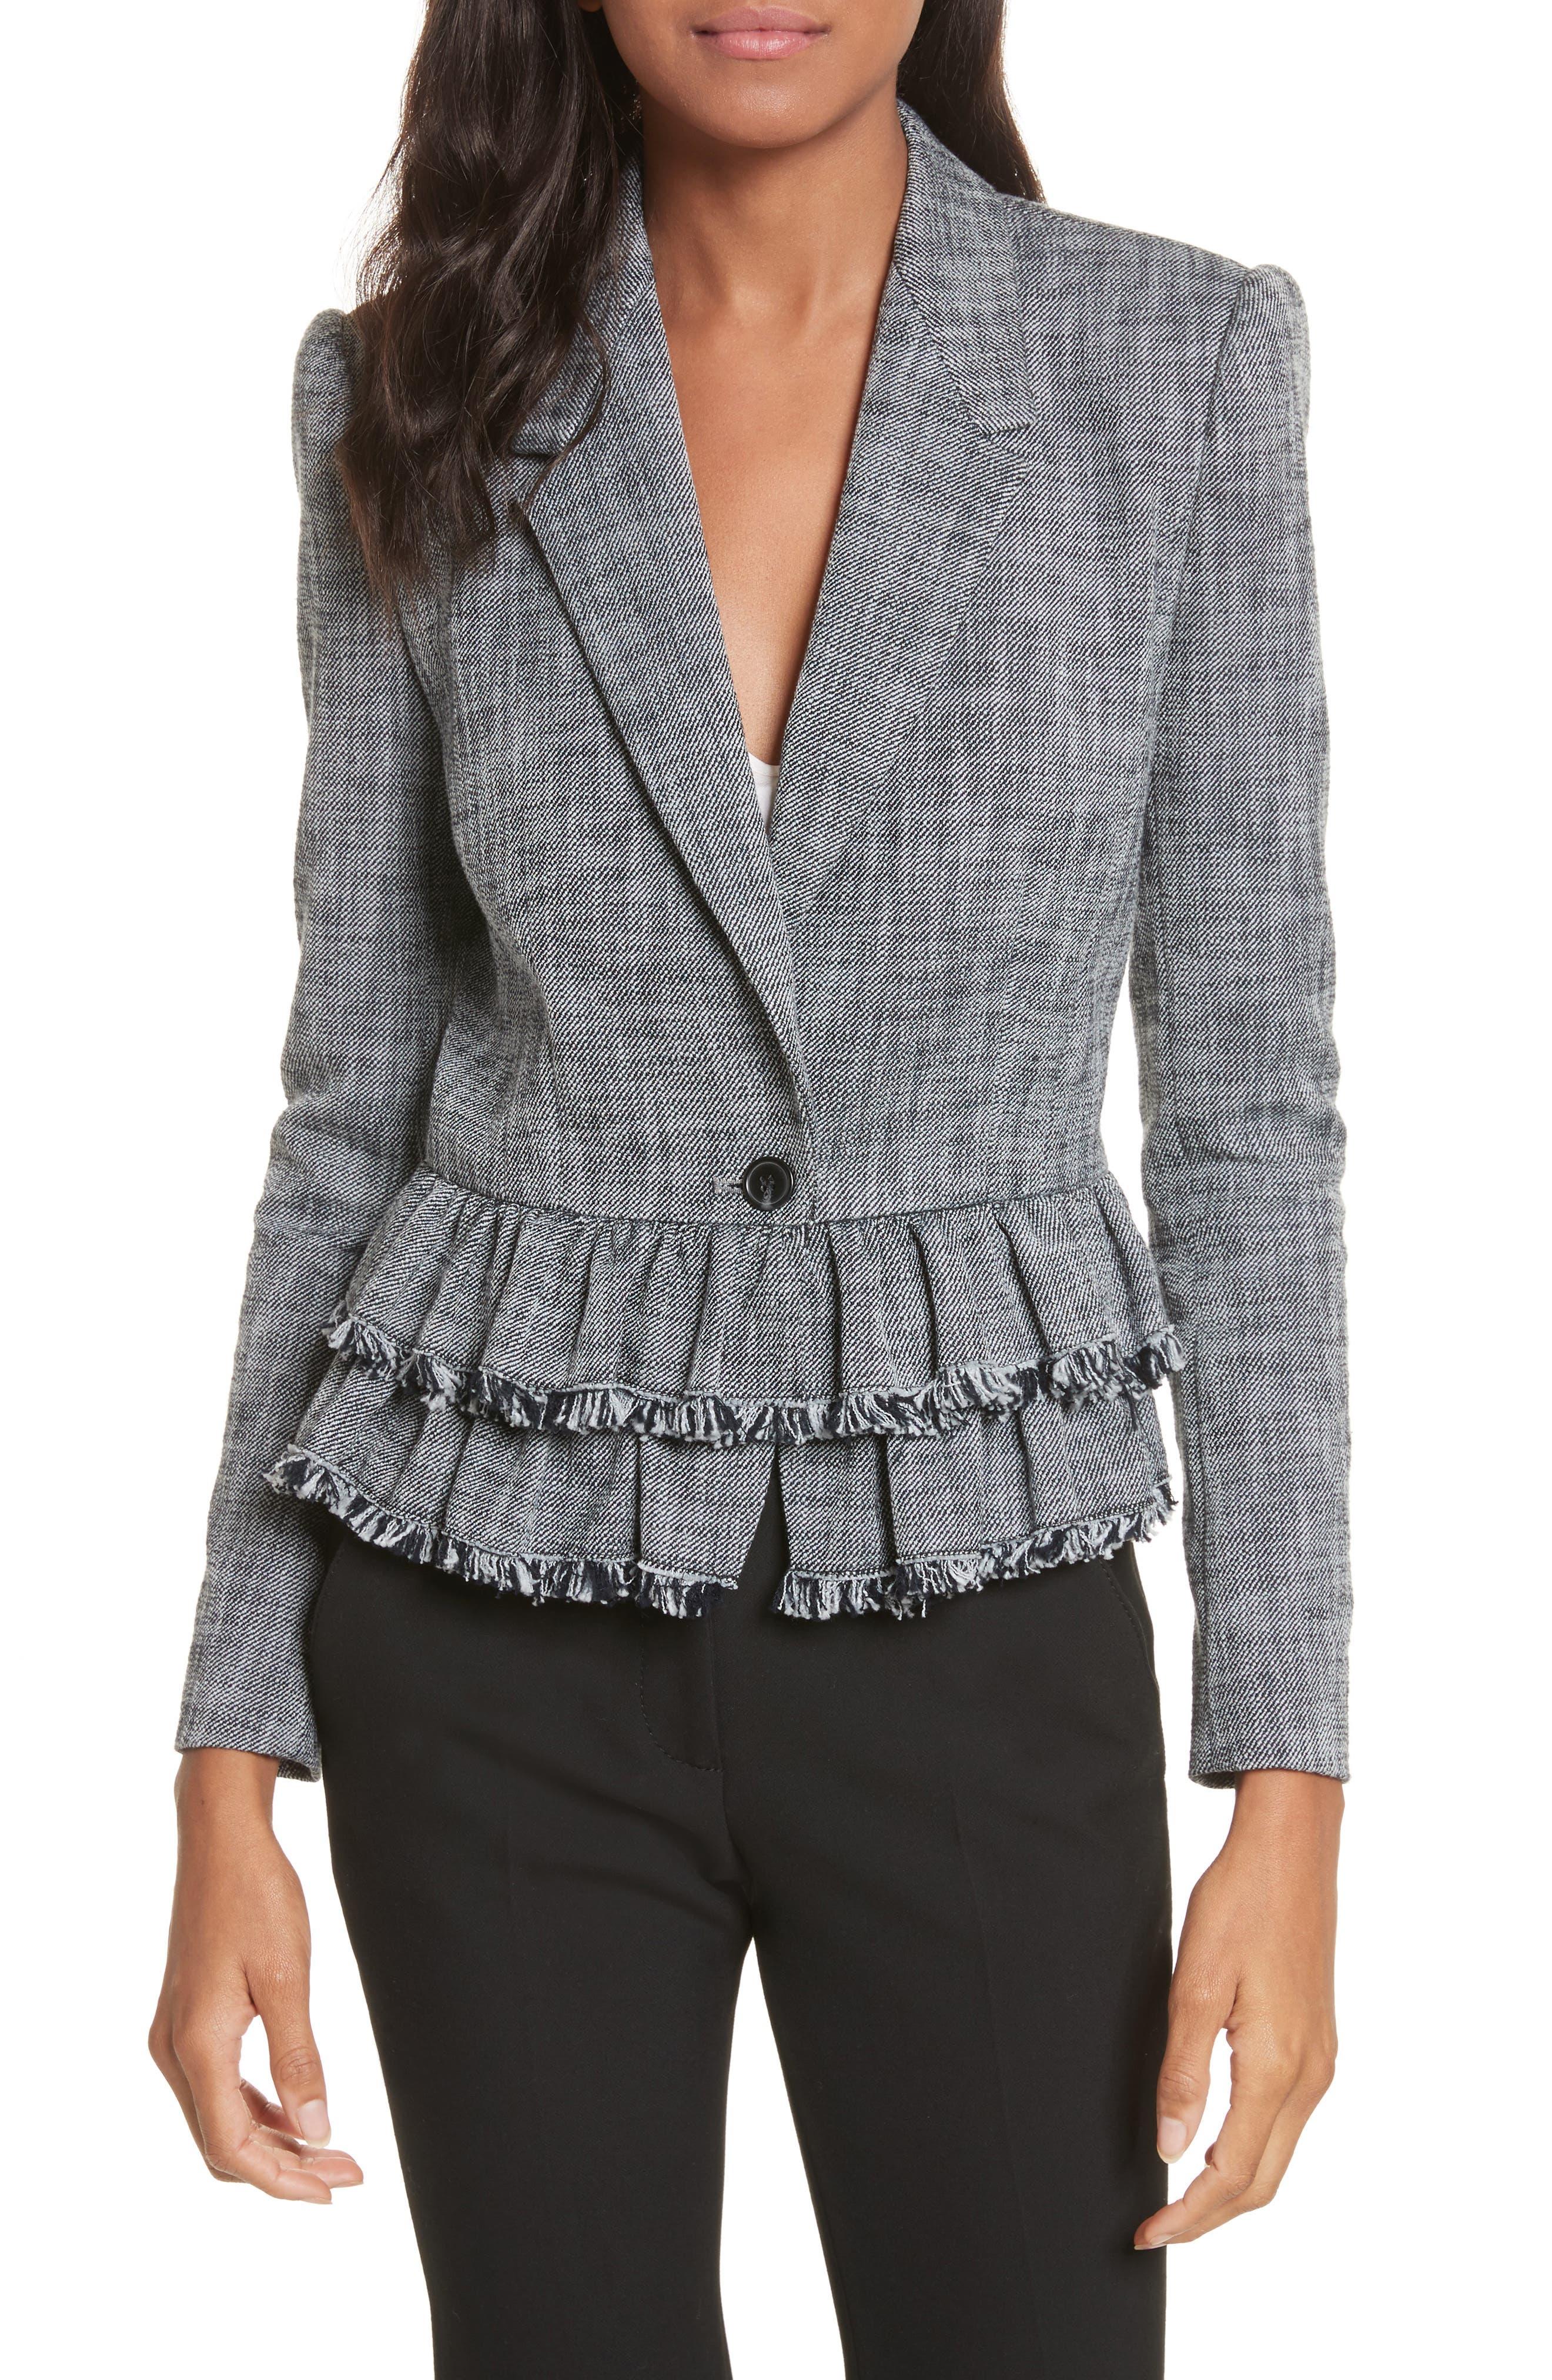 Alternate Image 1 Selected - Rebecca Taylor Slub Suiting Jacket